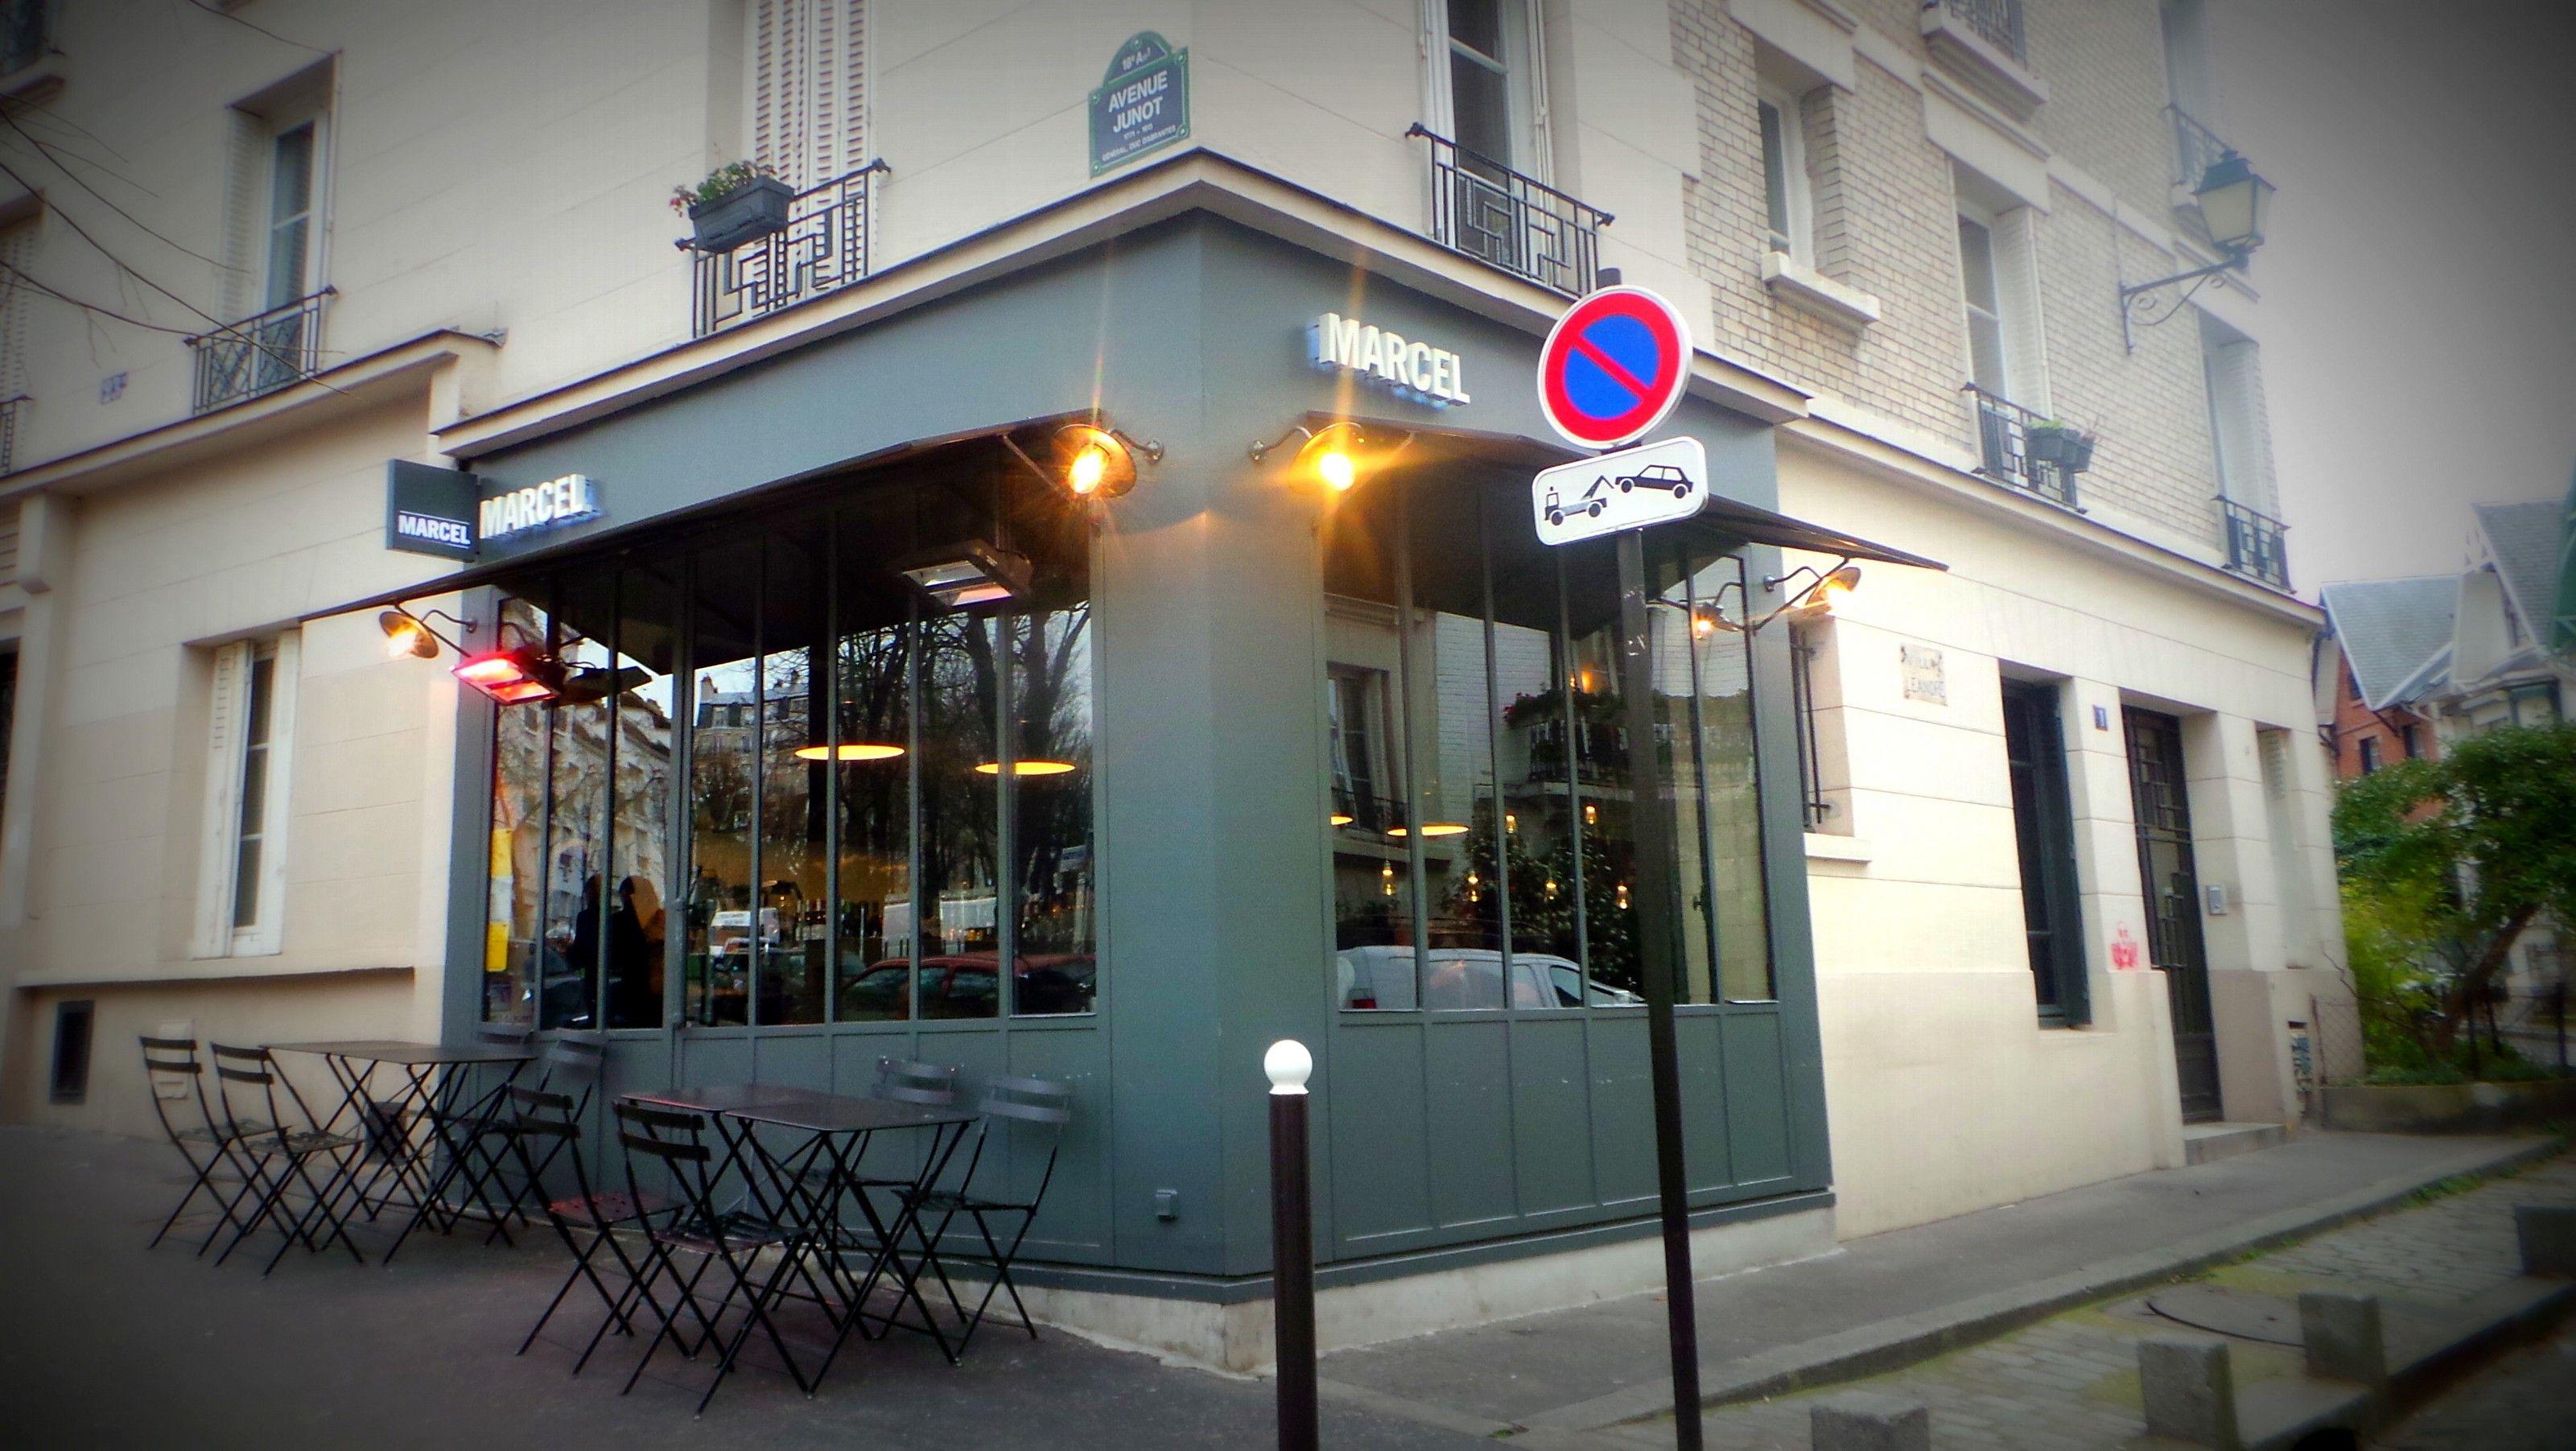 Marcel Le Petit Brooklyn Niche Dans Le 18eme Brooklyn Rue De Babylone Paris